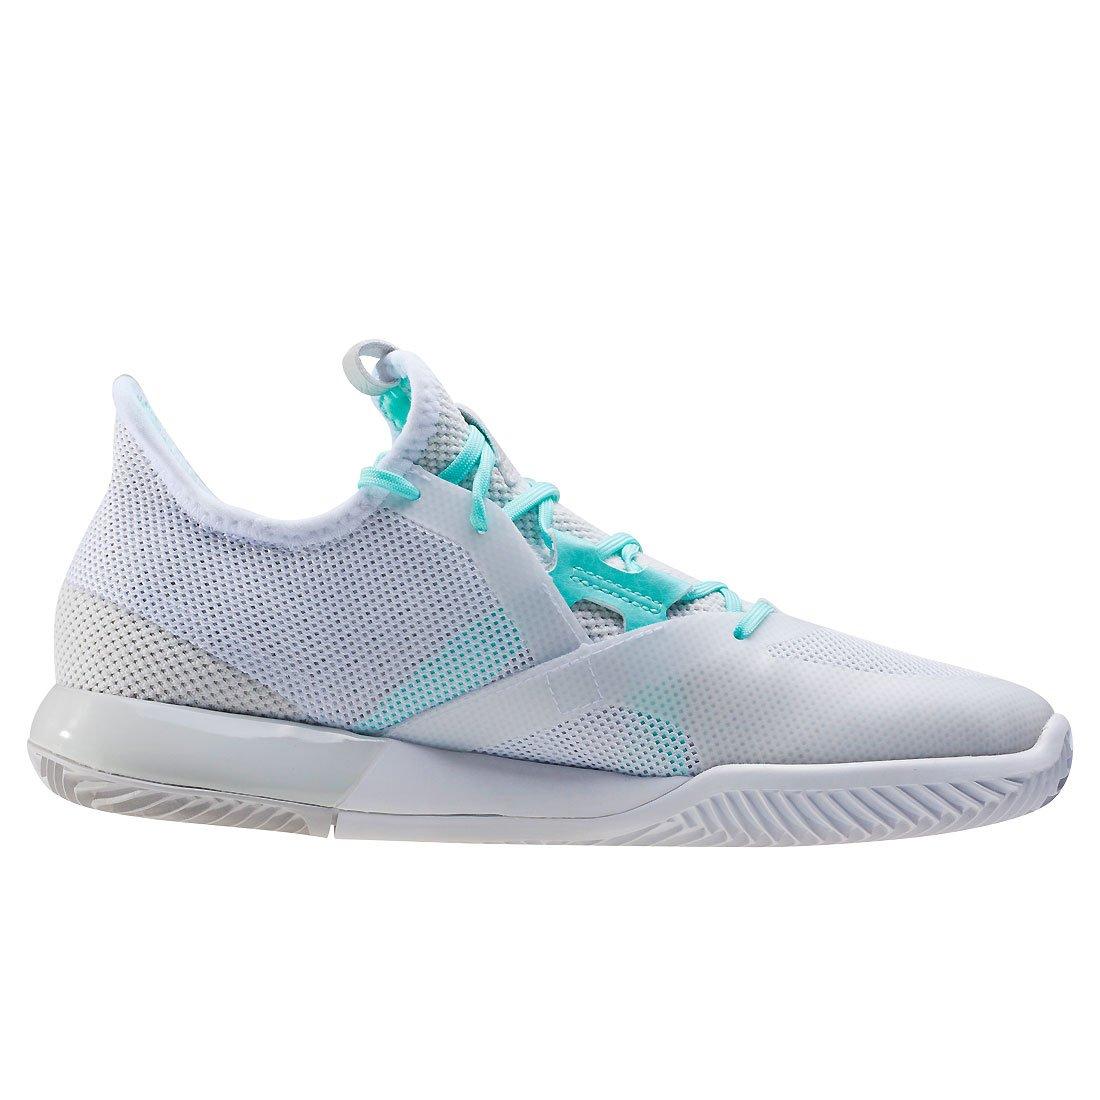 Adidas Damen Adizero Defiant Bounce W W W Tennisschuhe 74cf2b